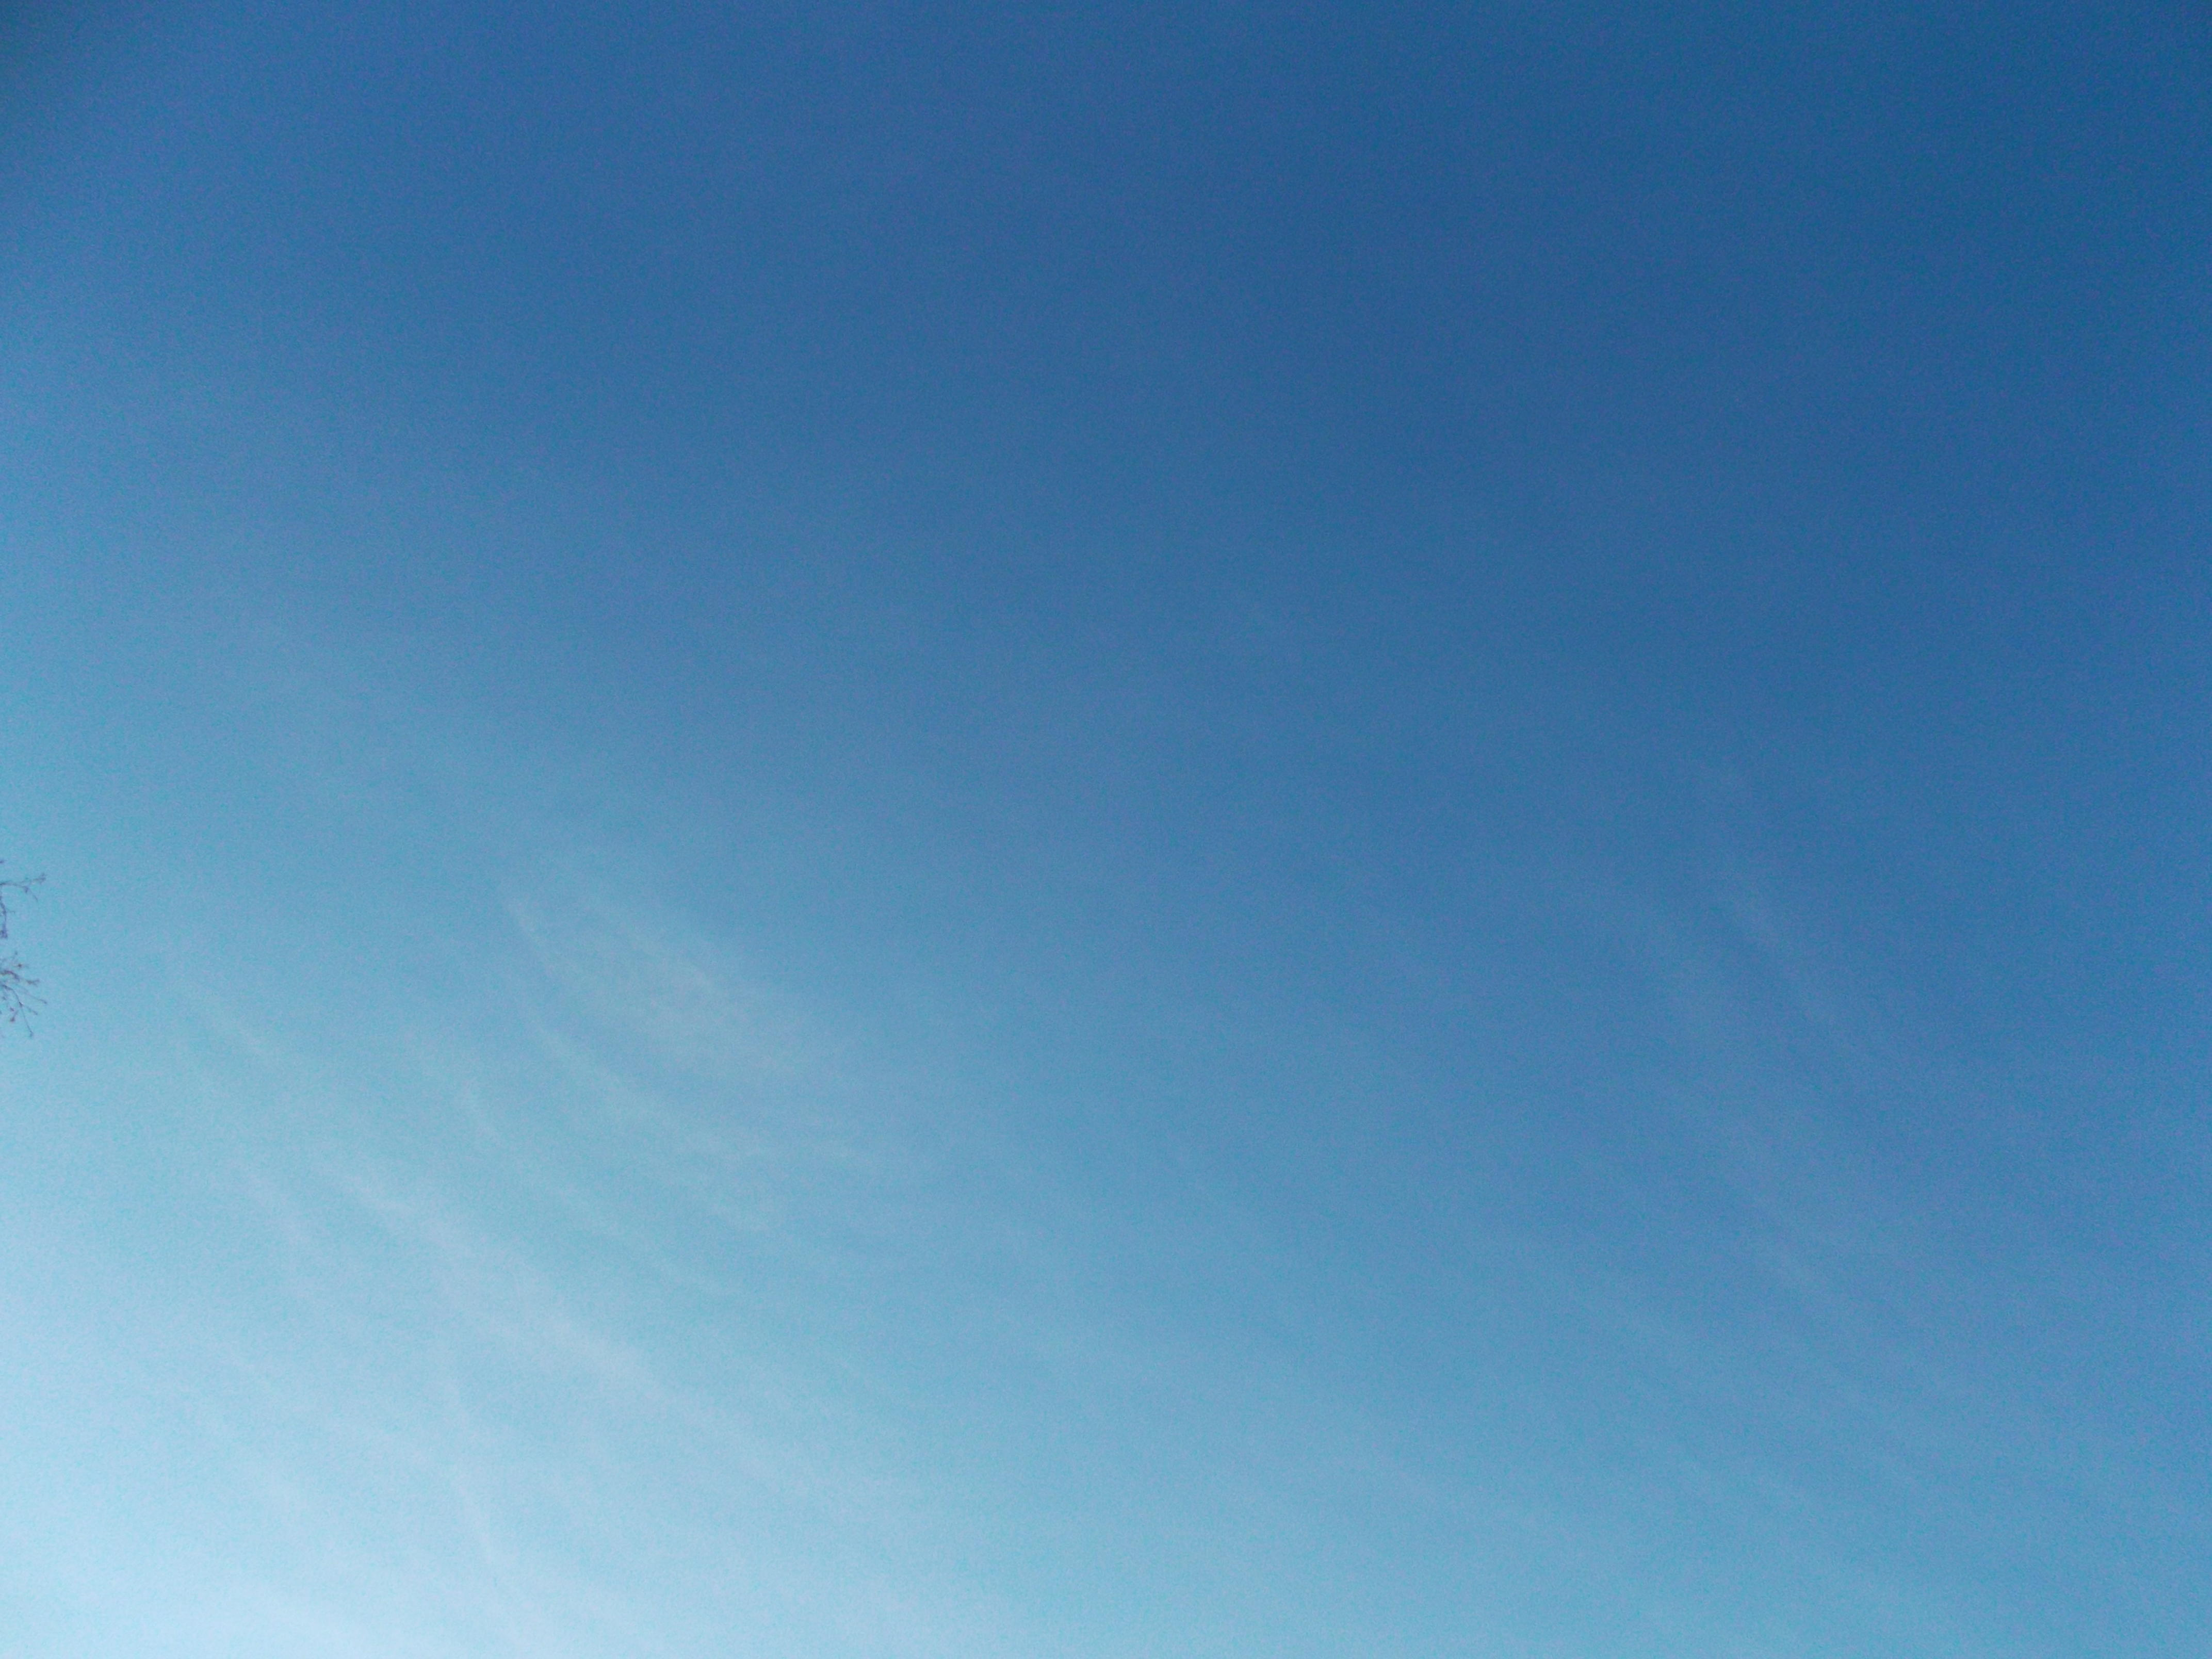 2013-01-17 Longitude -0.371 Latitude 49.182 Altitude 13 Heure 15h51